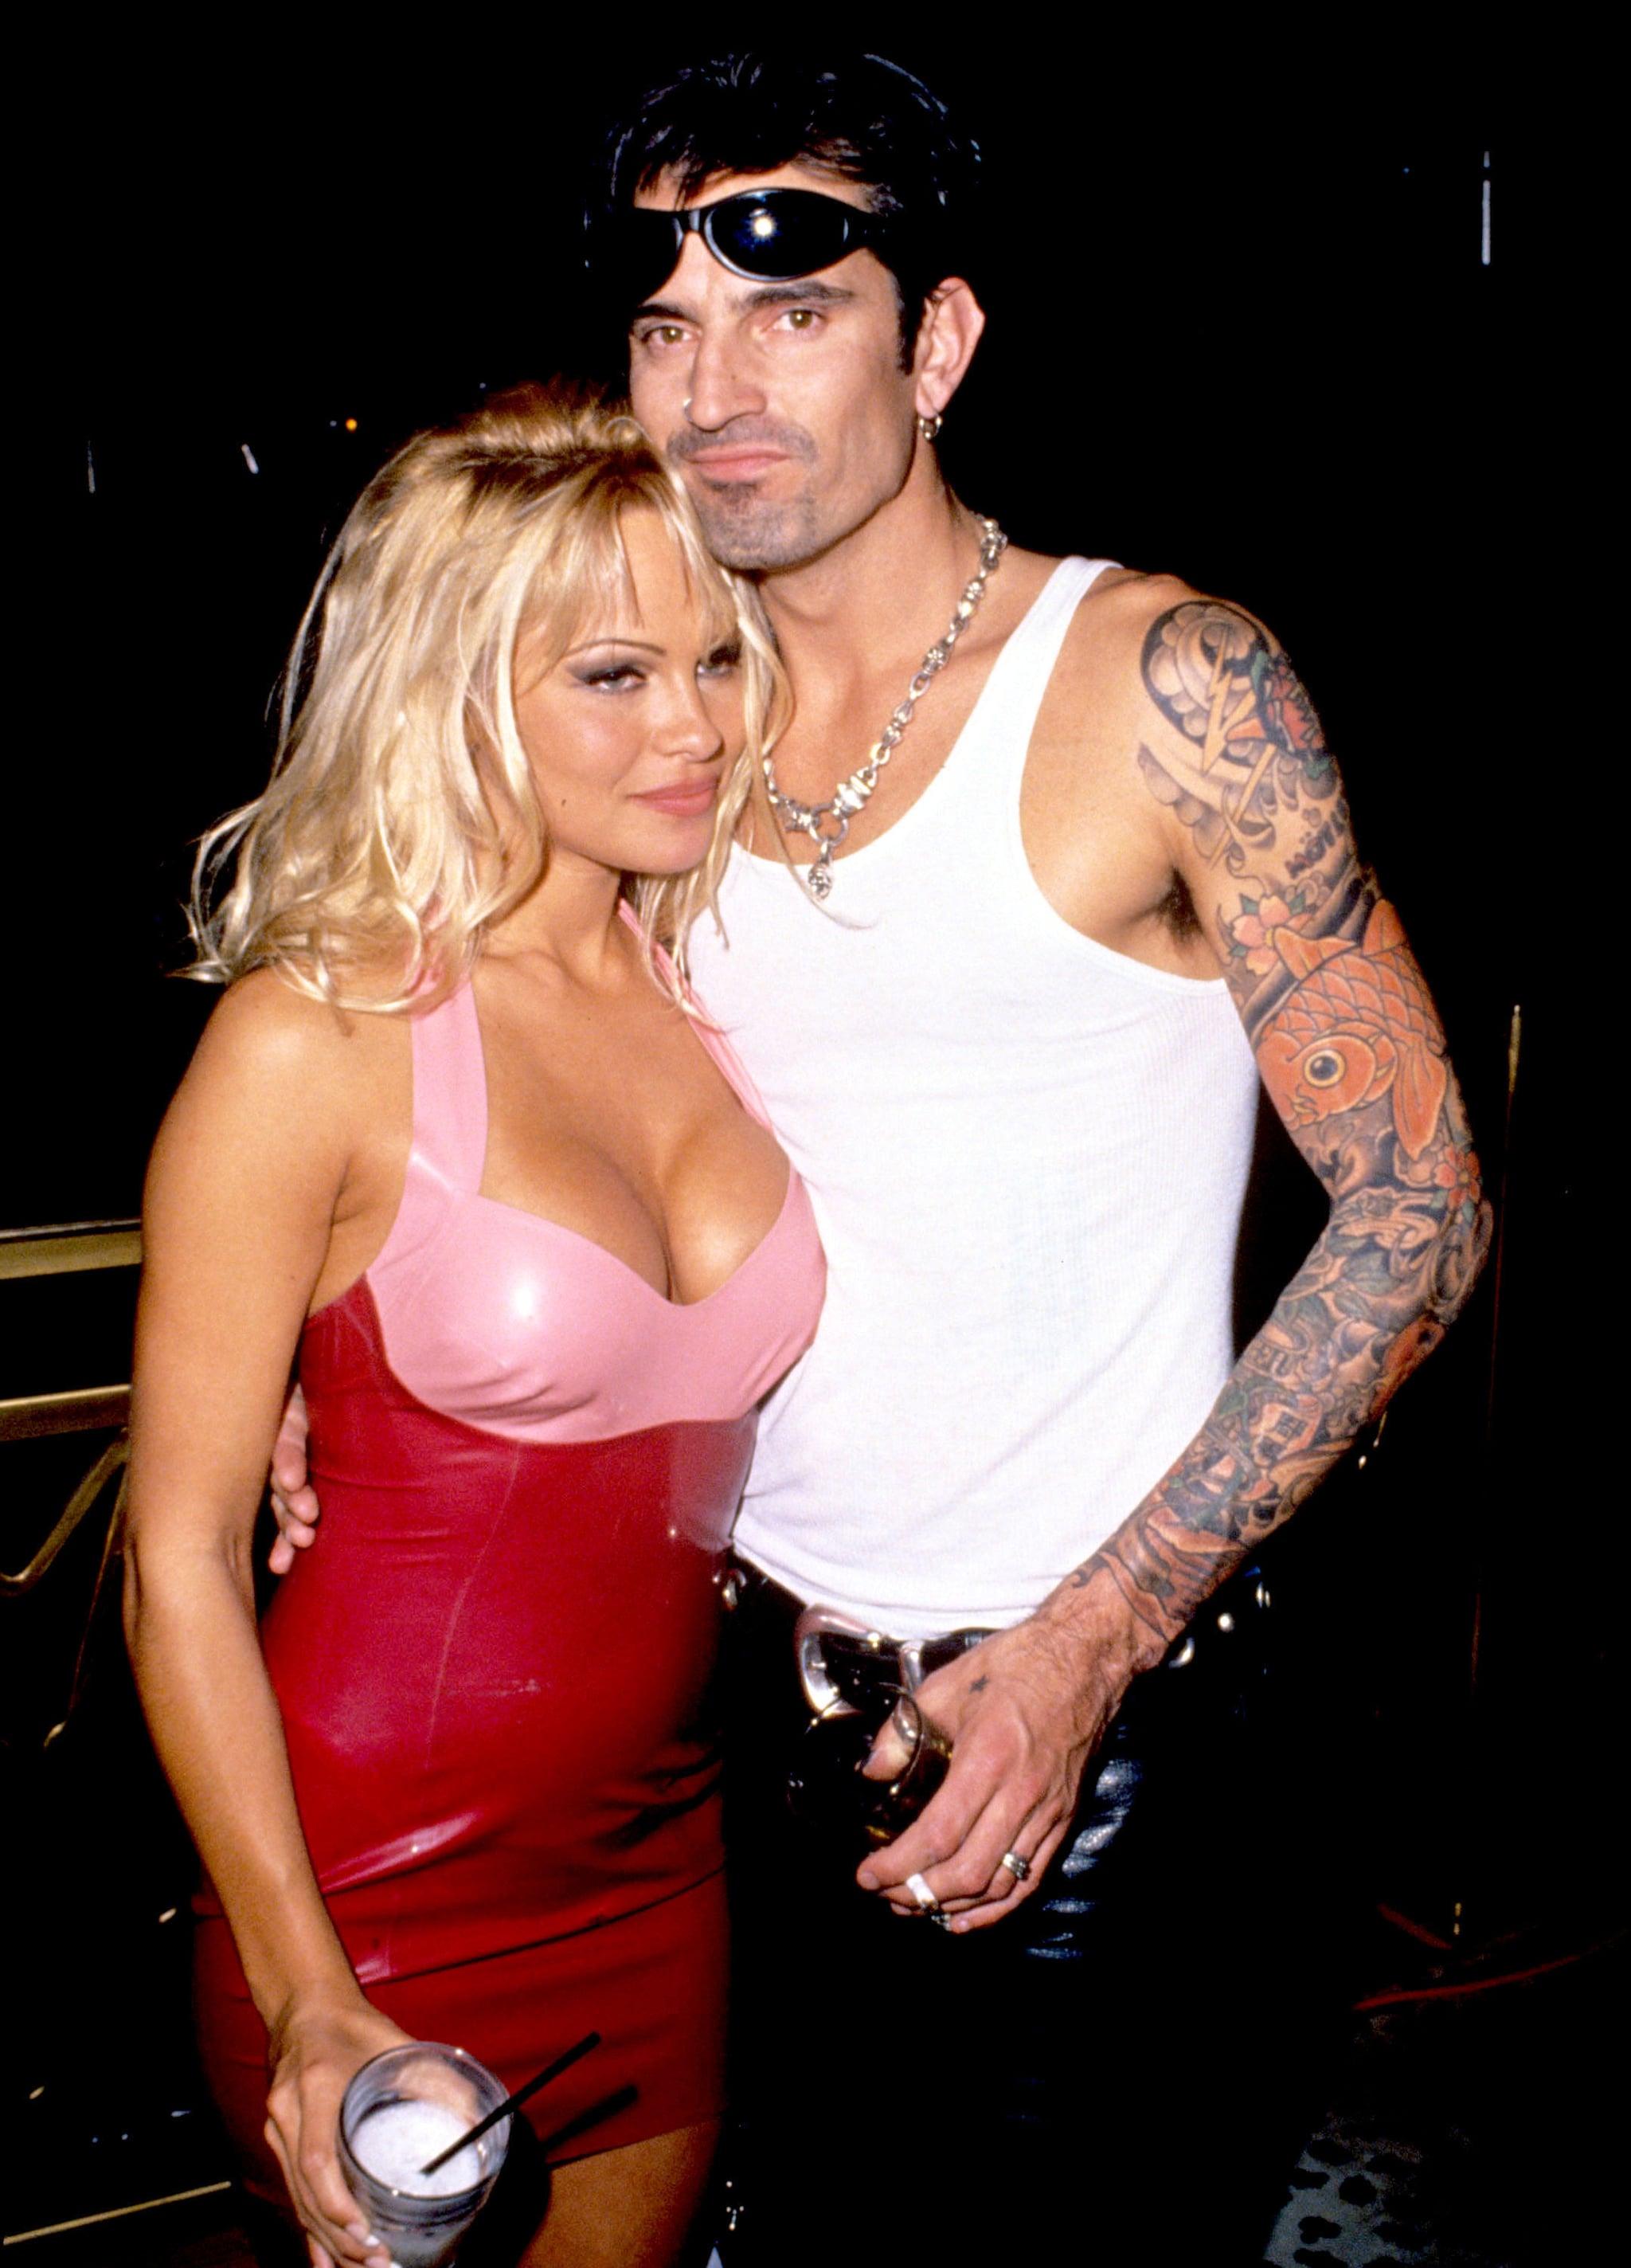 Pamela Anderson Lee Interviews Movie HD free download 720p